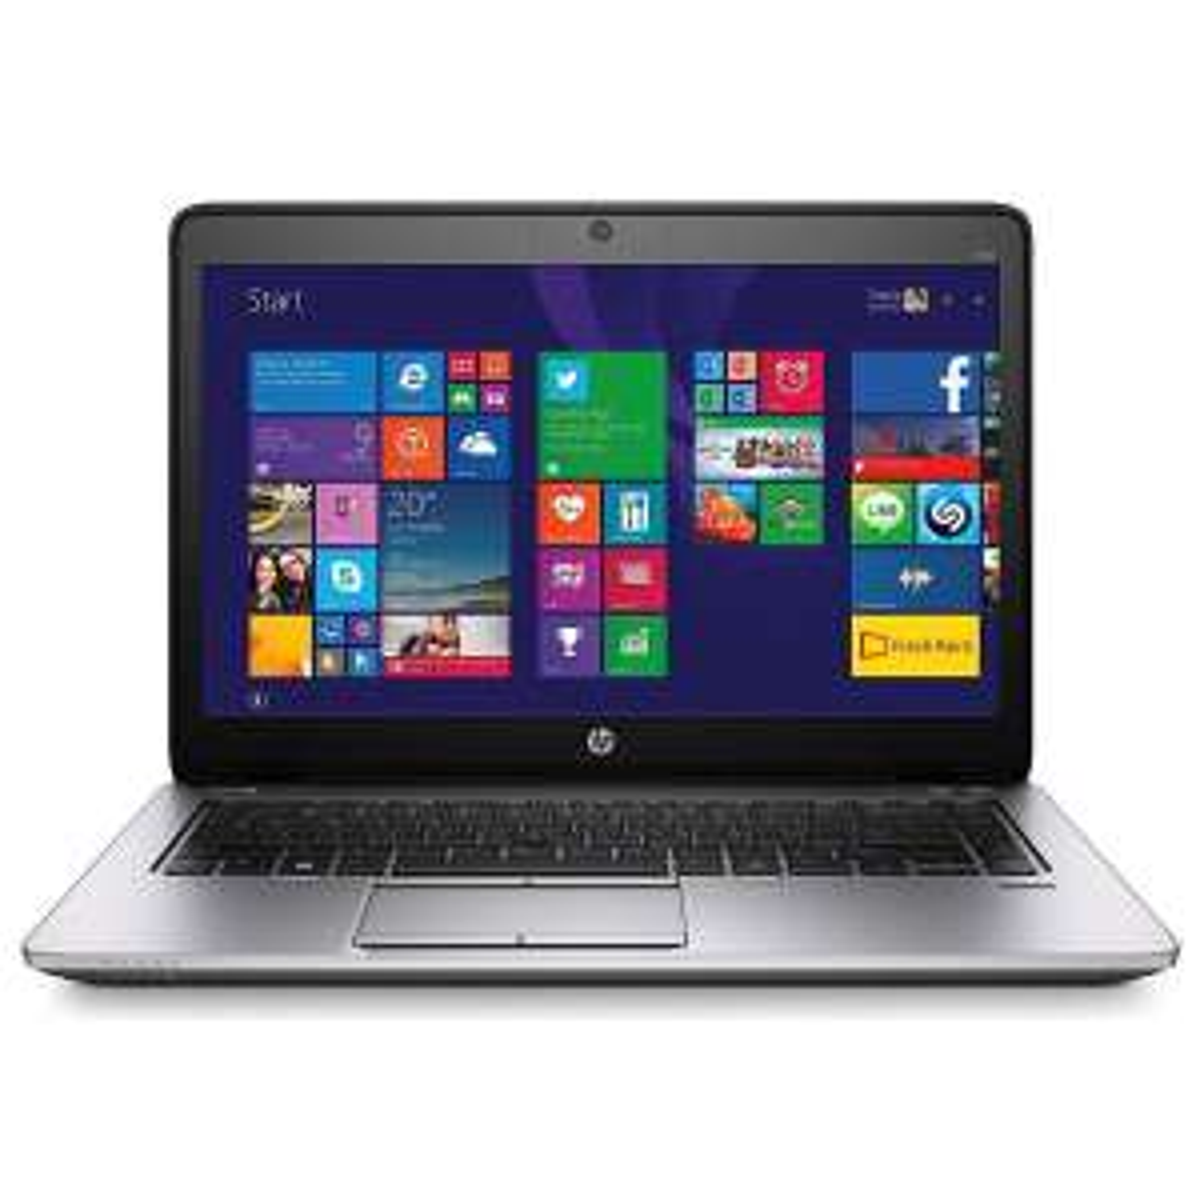 "PC Portable 14"" HP 840 G2 - I5 5200U, 8 Go Ram, HDD 320 Go, HD+, Reconditionné"